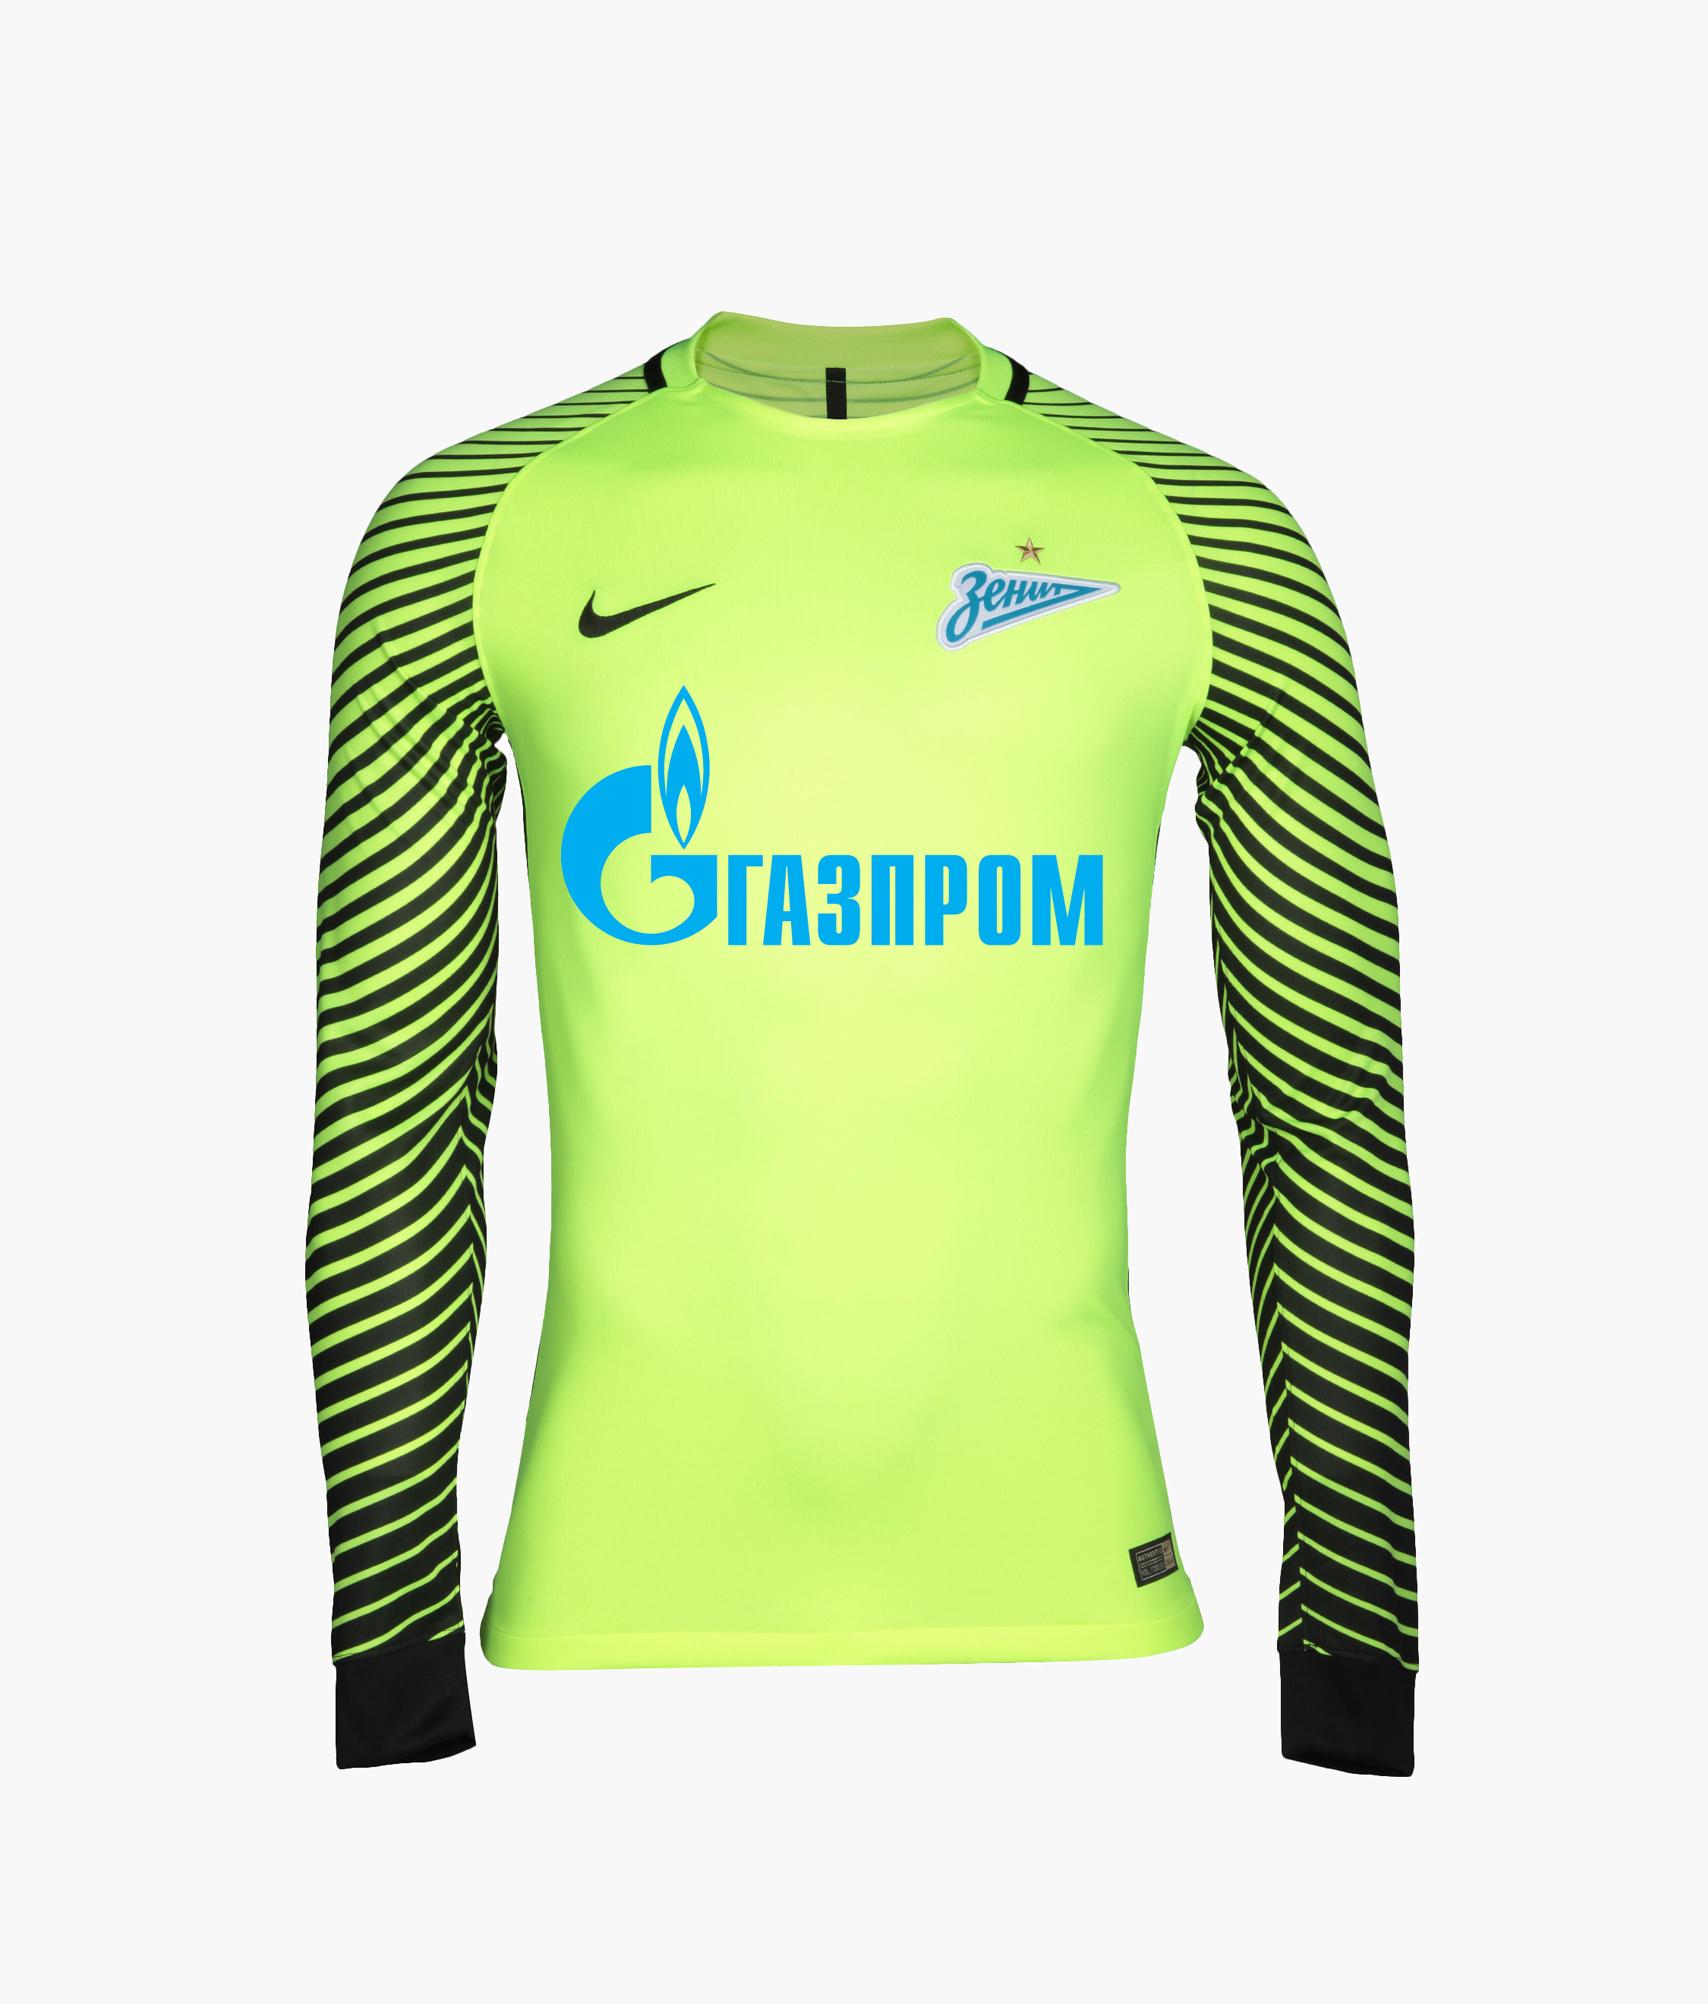 Оригинальная вратарская футболка Nike Nike Цвет-Желтый